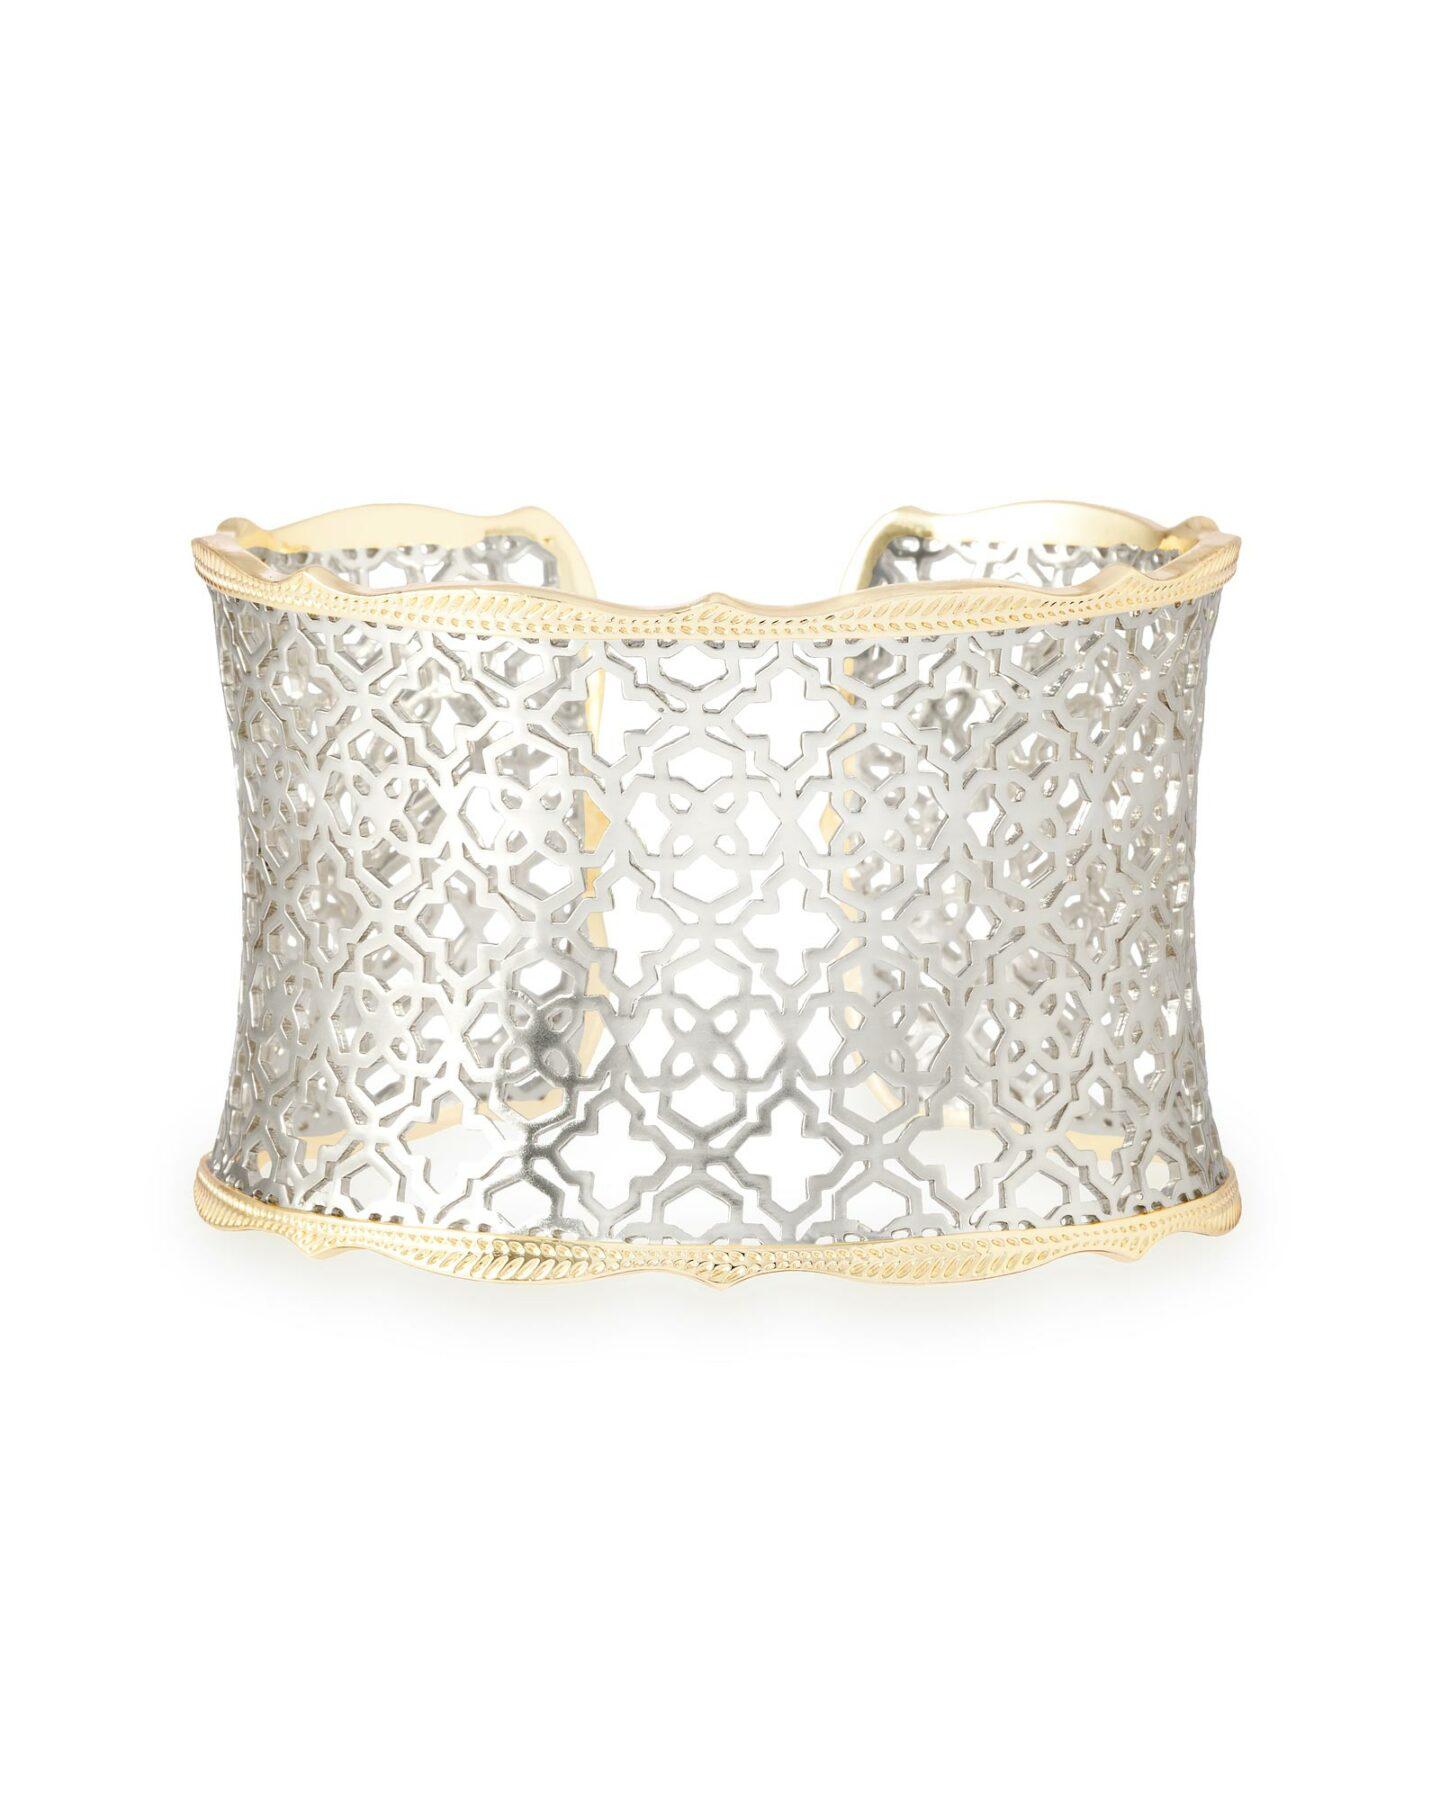 kendra scott candice cuff bracelet silver and gold